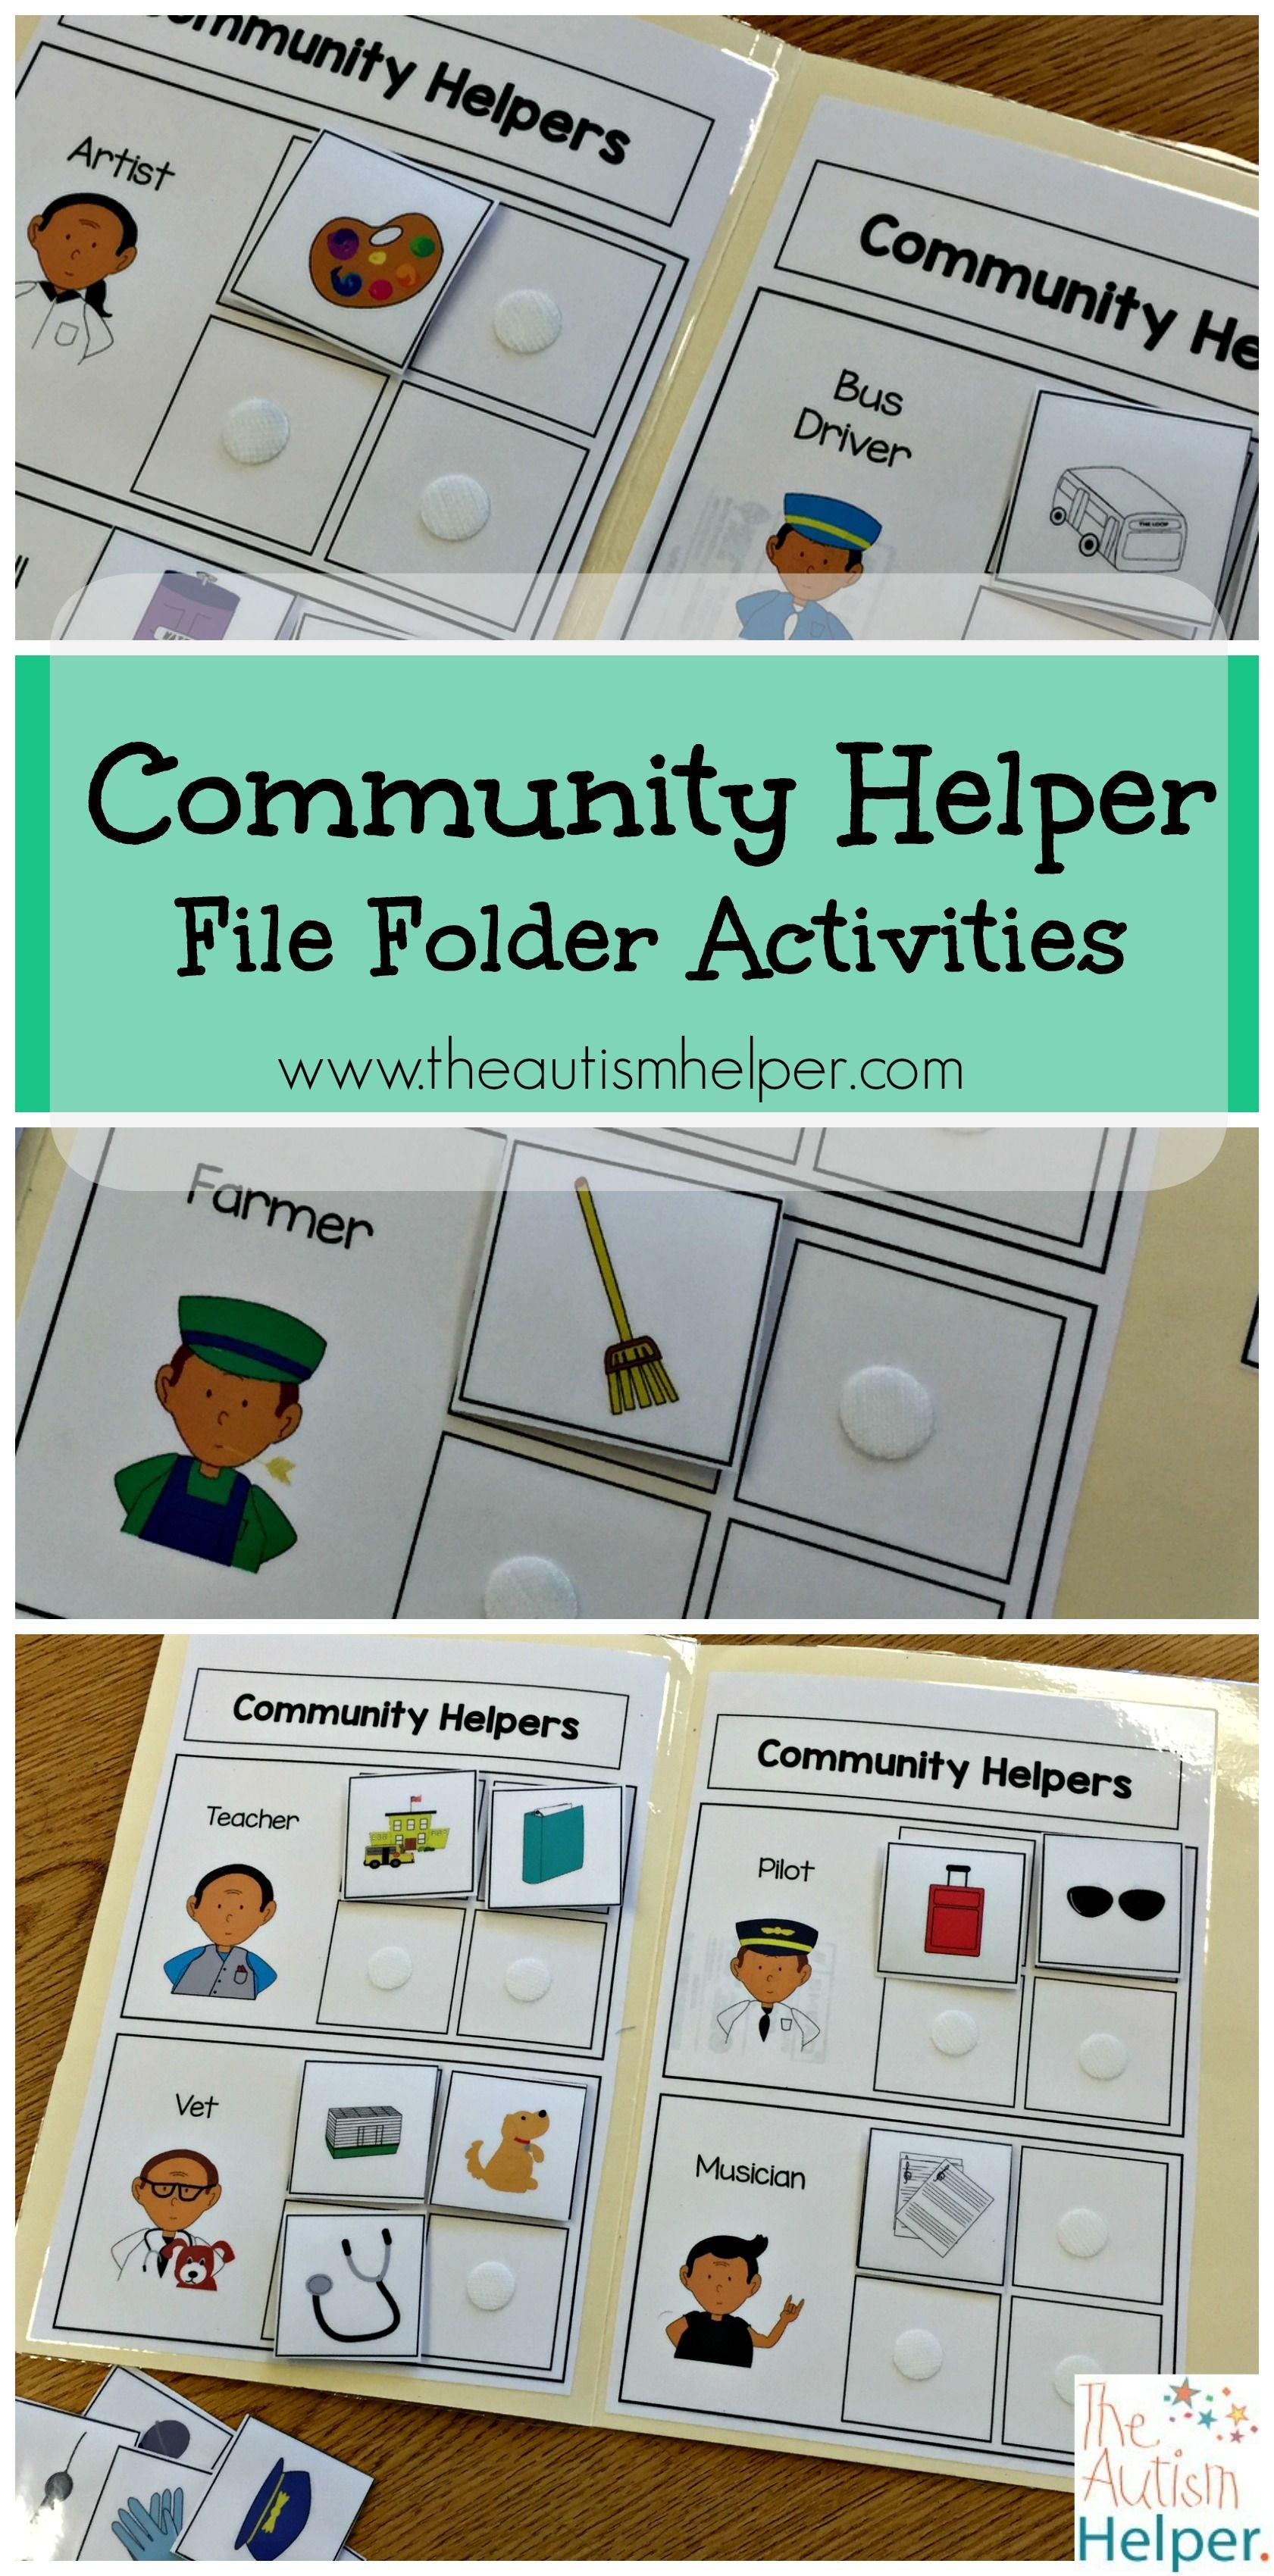 Community Helper File Folder Activities | Pinterest | Community ...